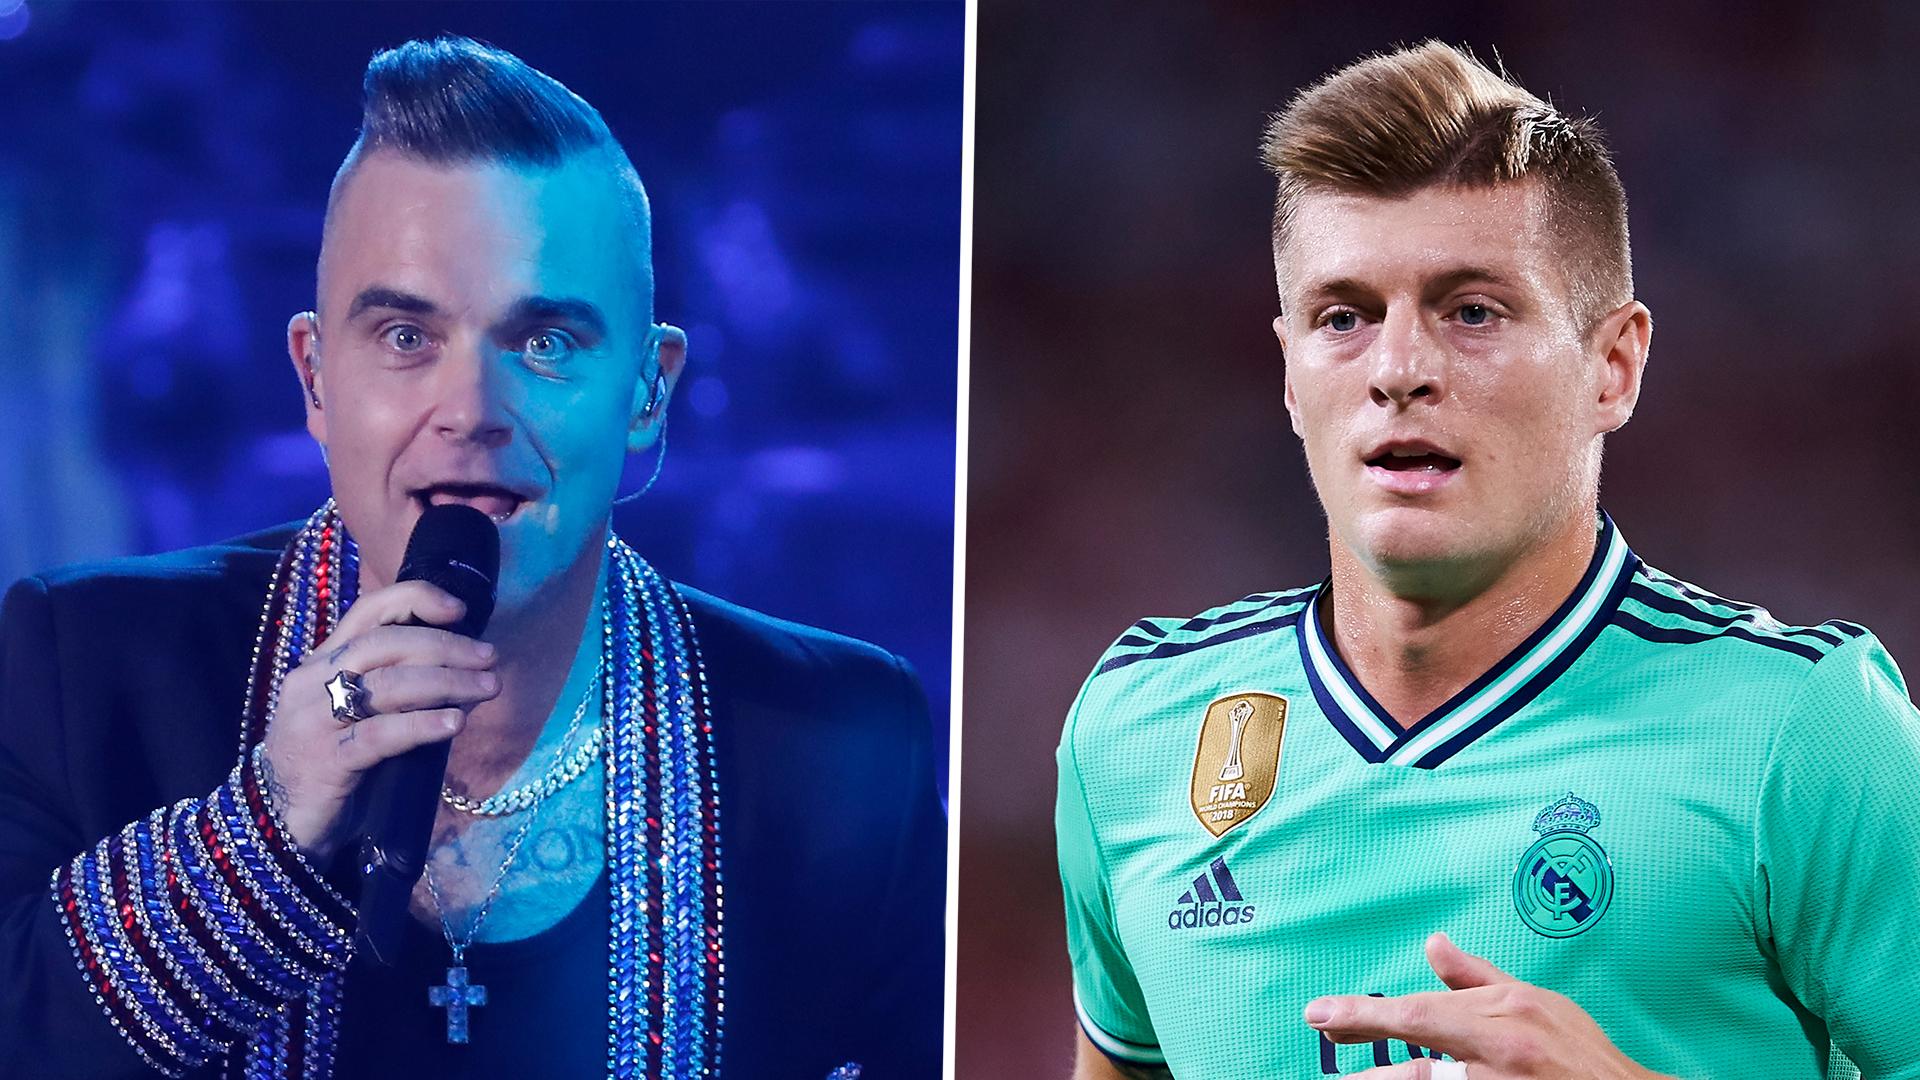 Rayu Toni Kroos Gabung Manchester United Robbie Williams